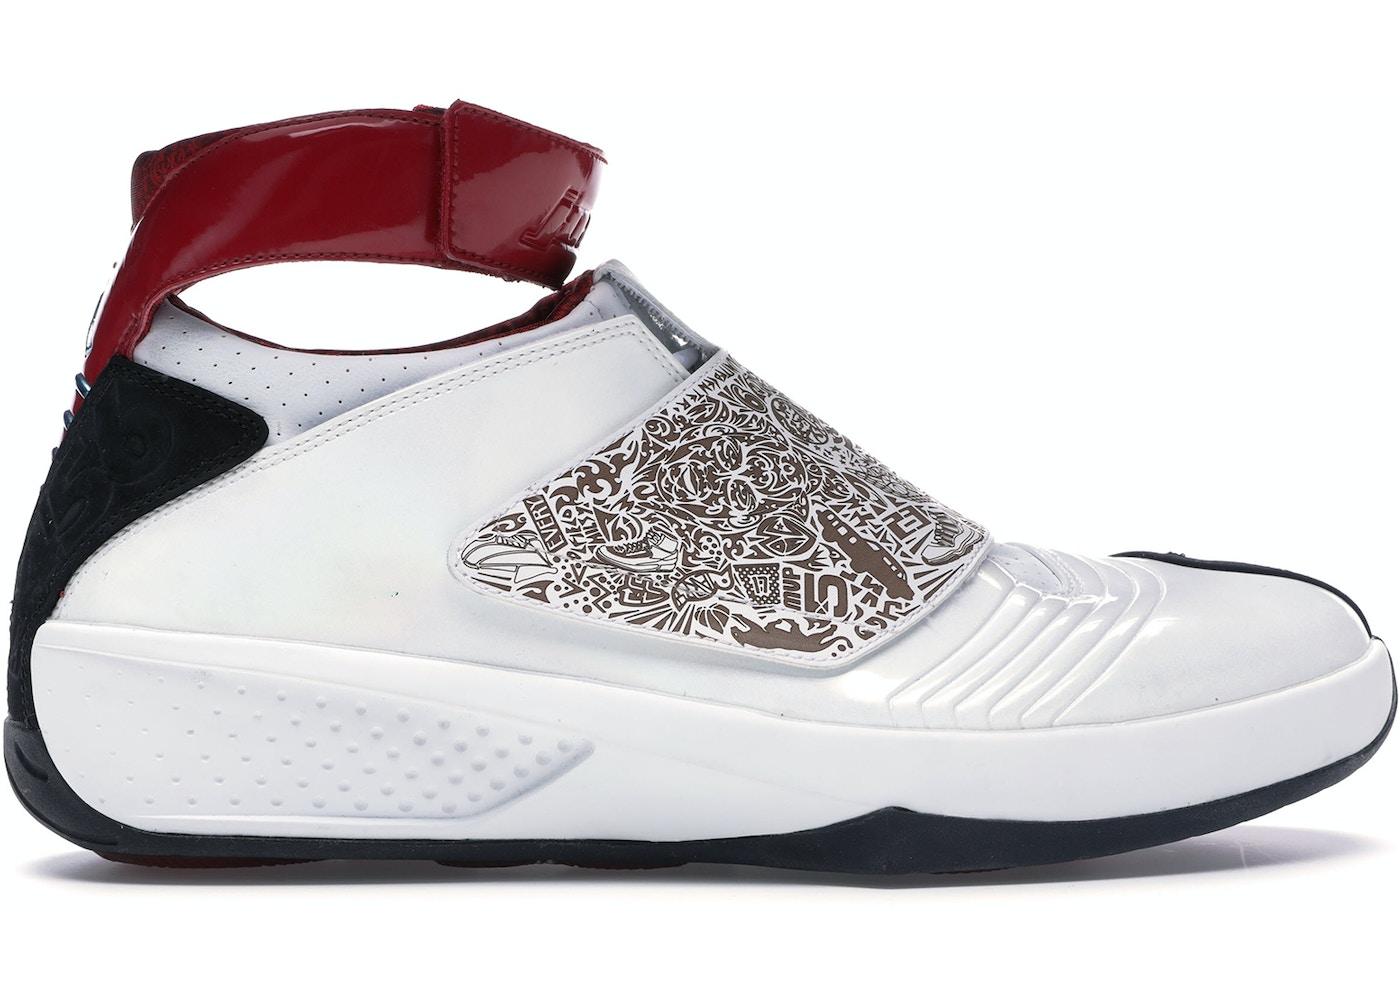 official photos 2fb48 8c94a Buy Air Jordan 20 Shoes   Deadstock Sneakers